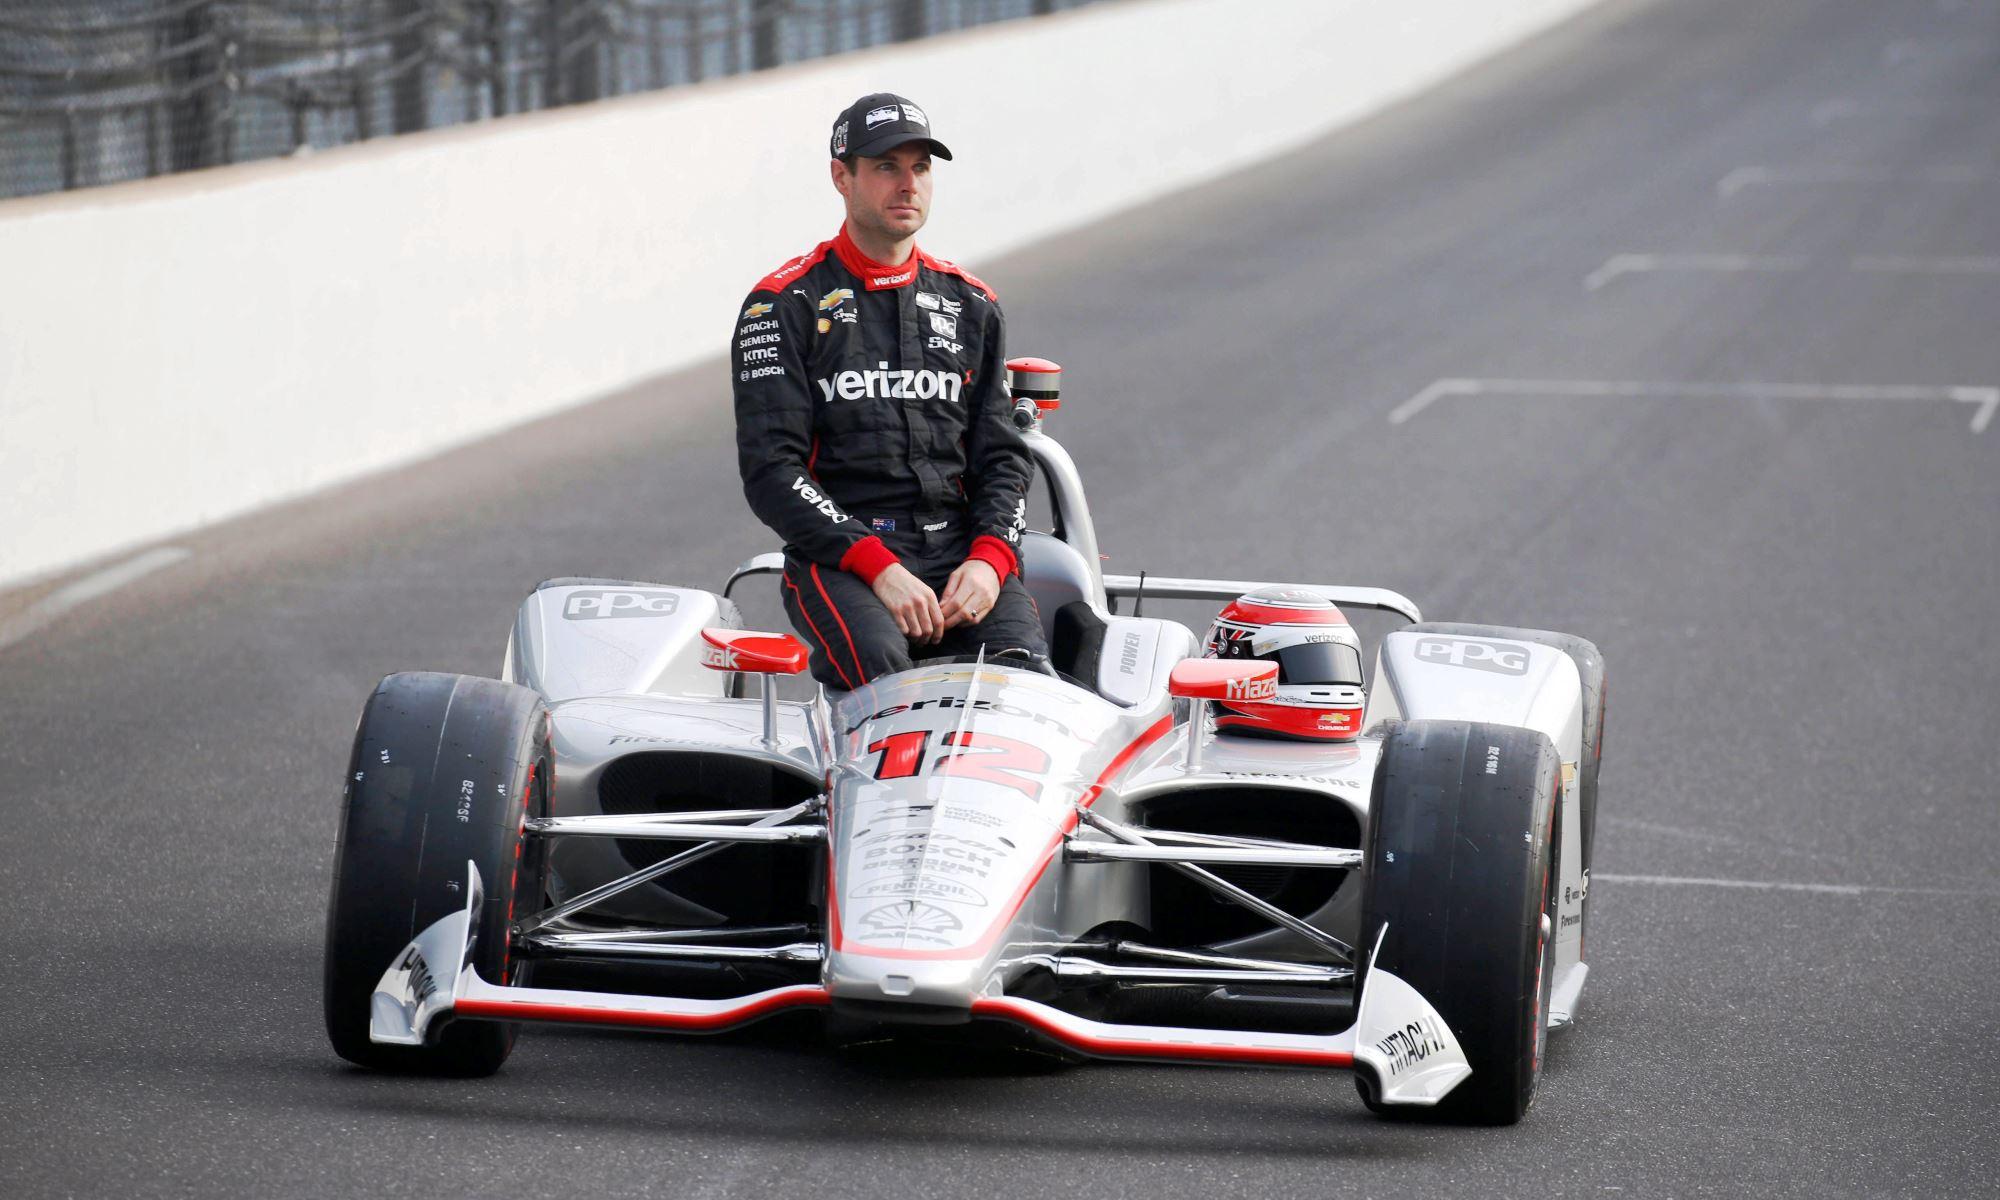 Indy 500 winner Will Power